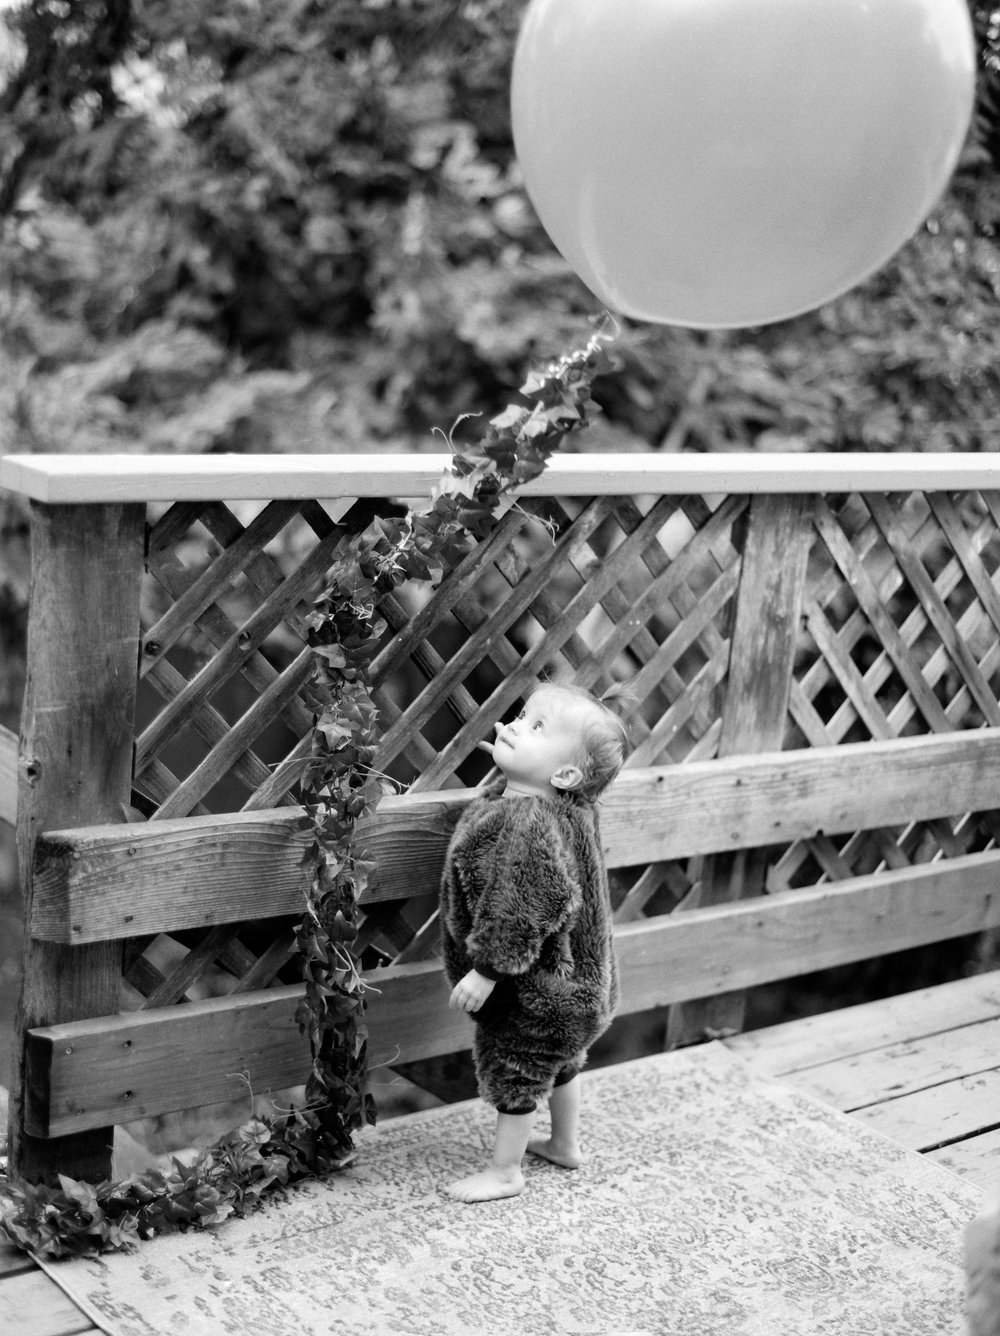 babywithballoon.jpg